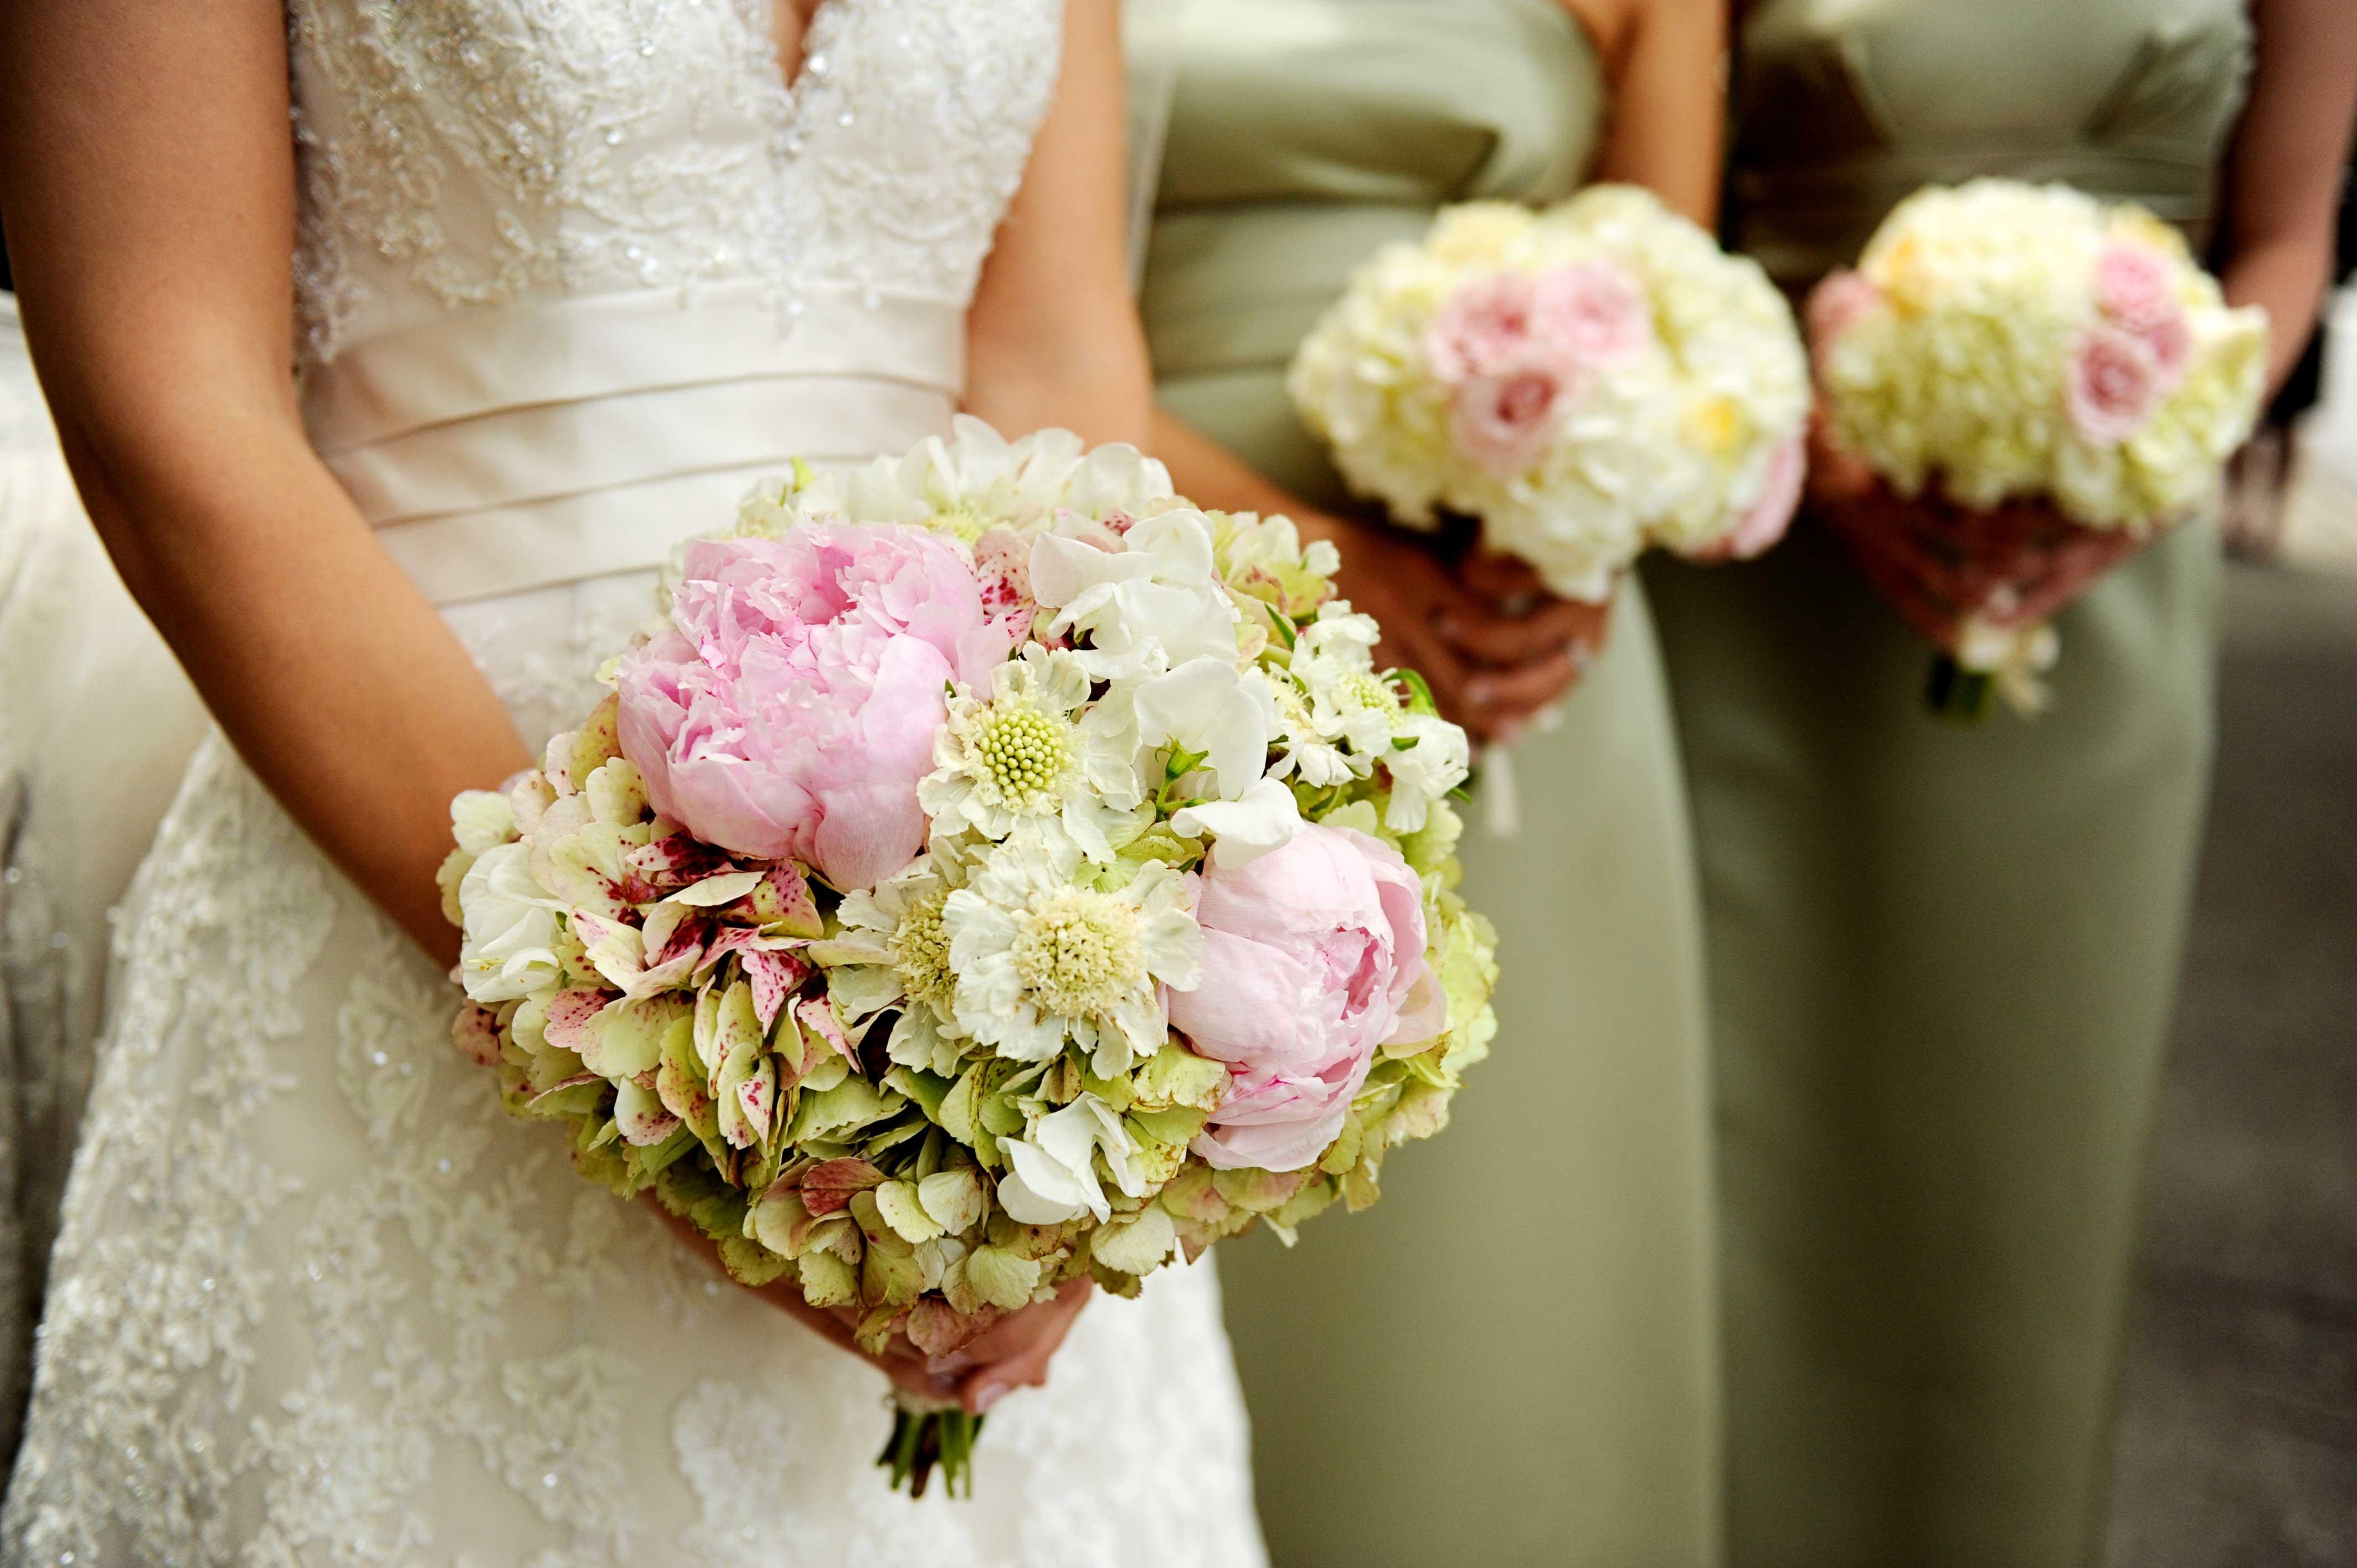 wedding flower tips experts flowers for weddings Wedding Flower Tips from The Experts